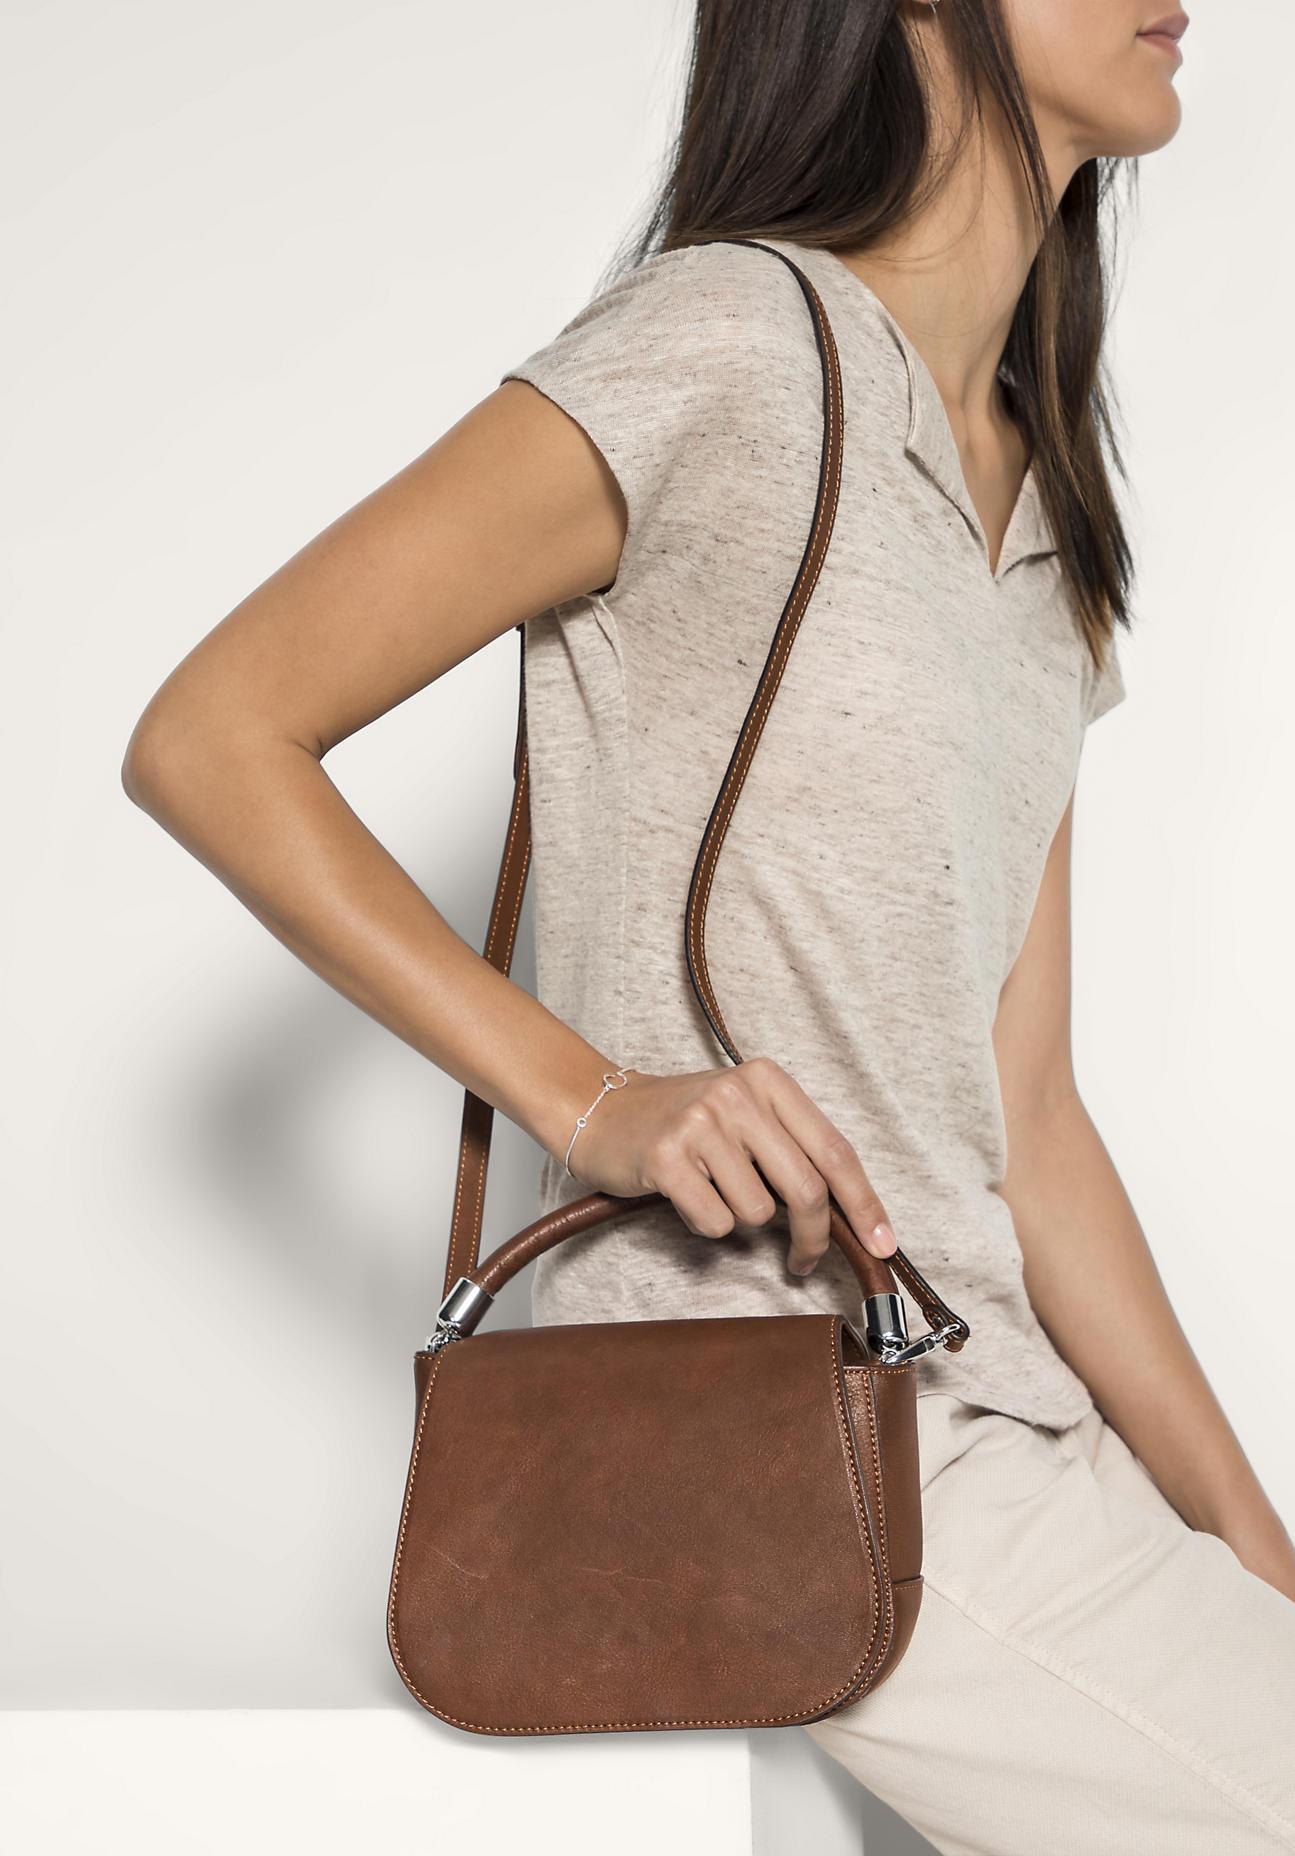 hessnatur Damen Tasche aus Leder – braun – Größ...